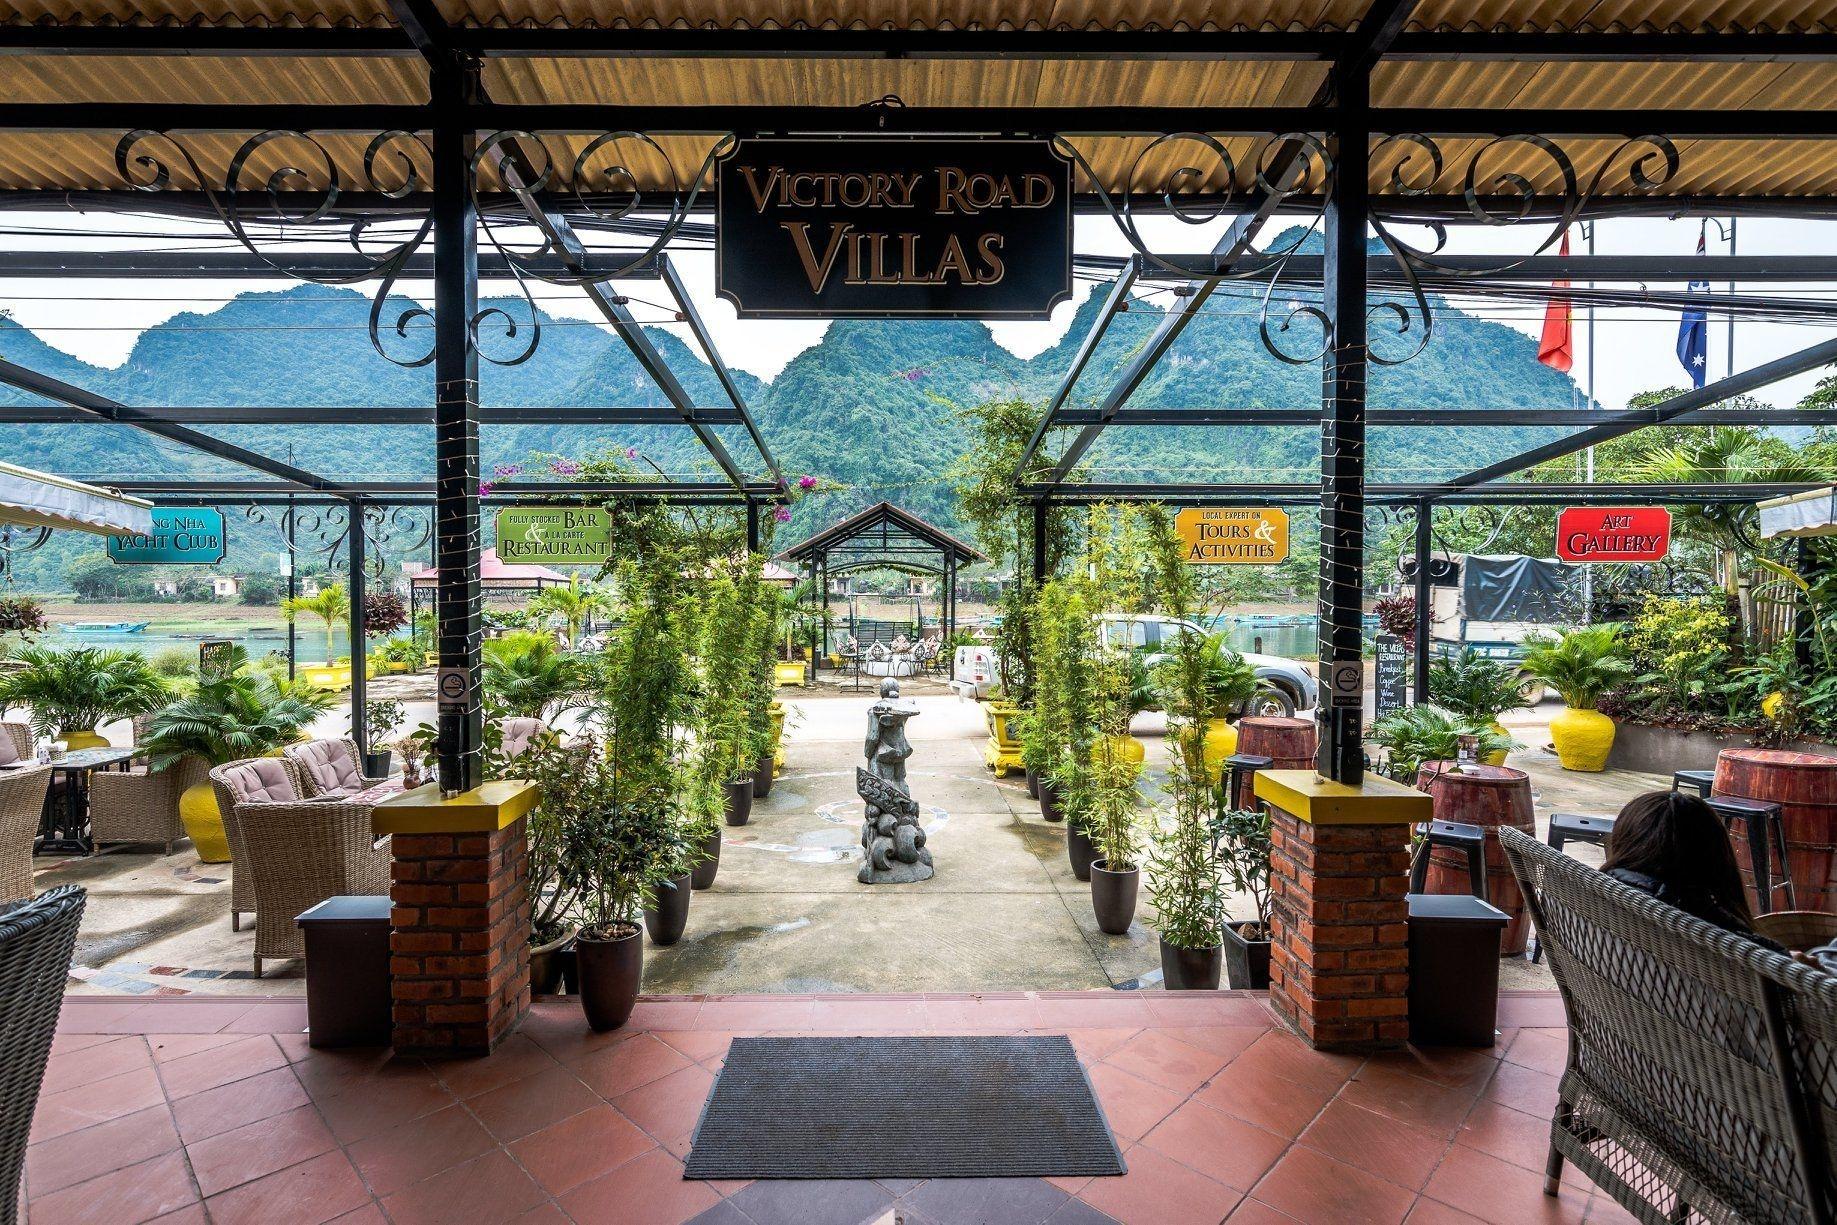 Victory Road Villas, Bố Trạch